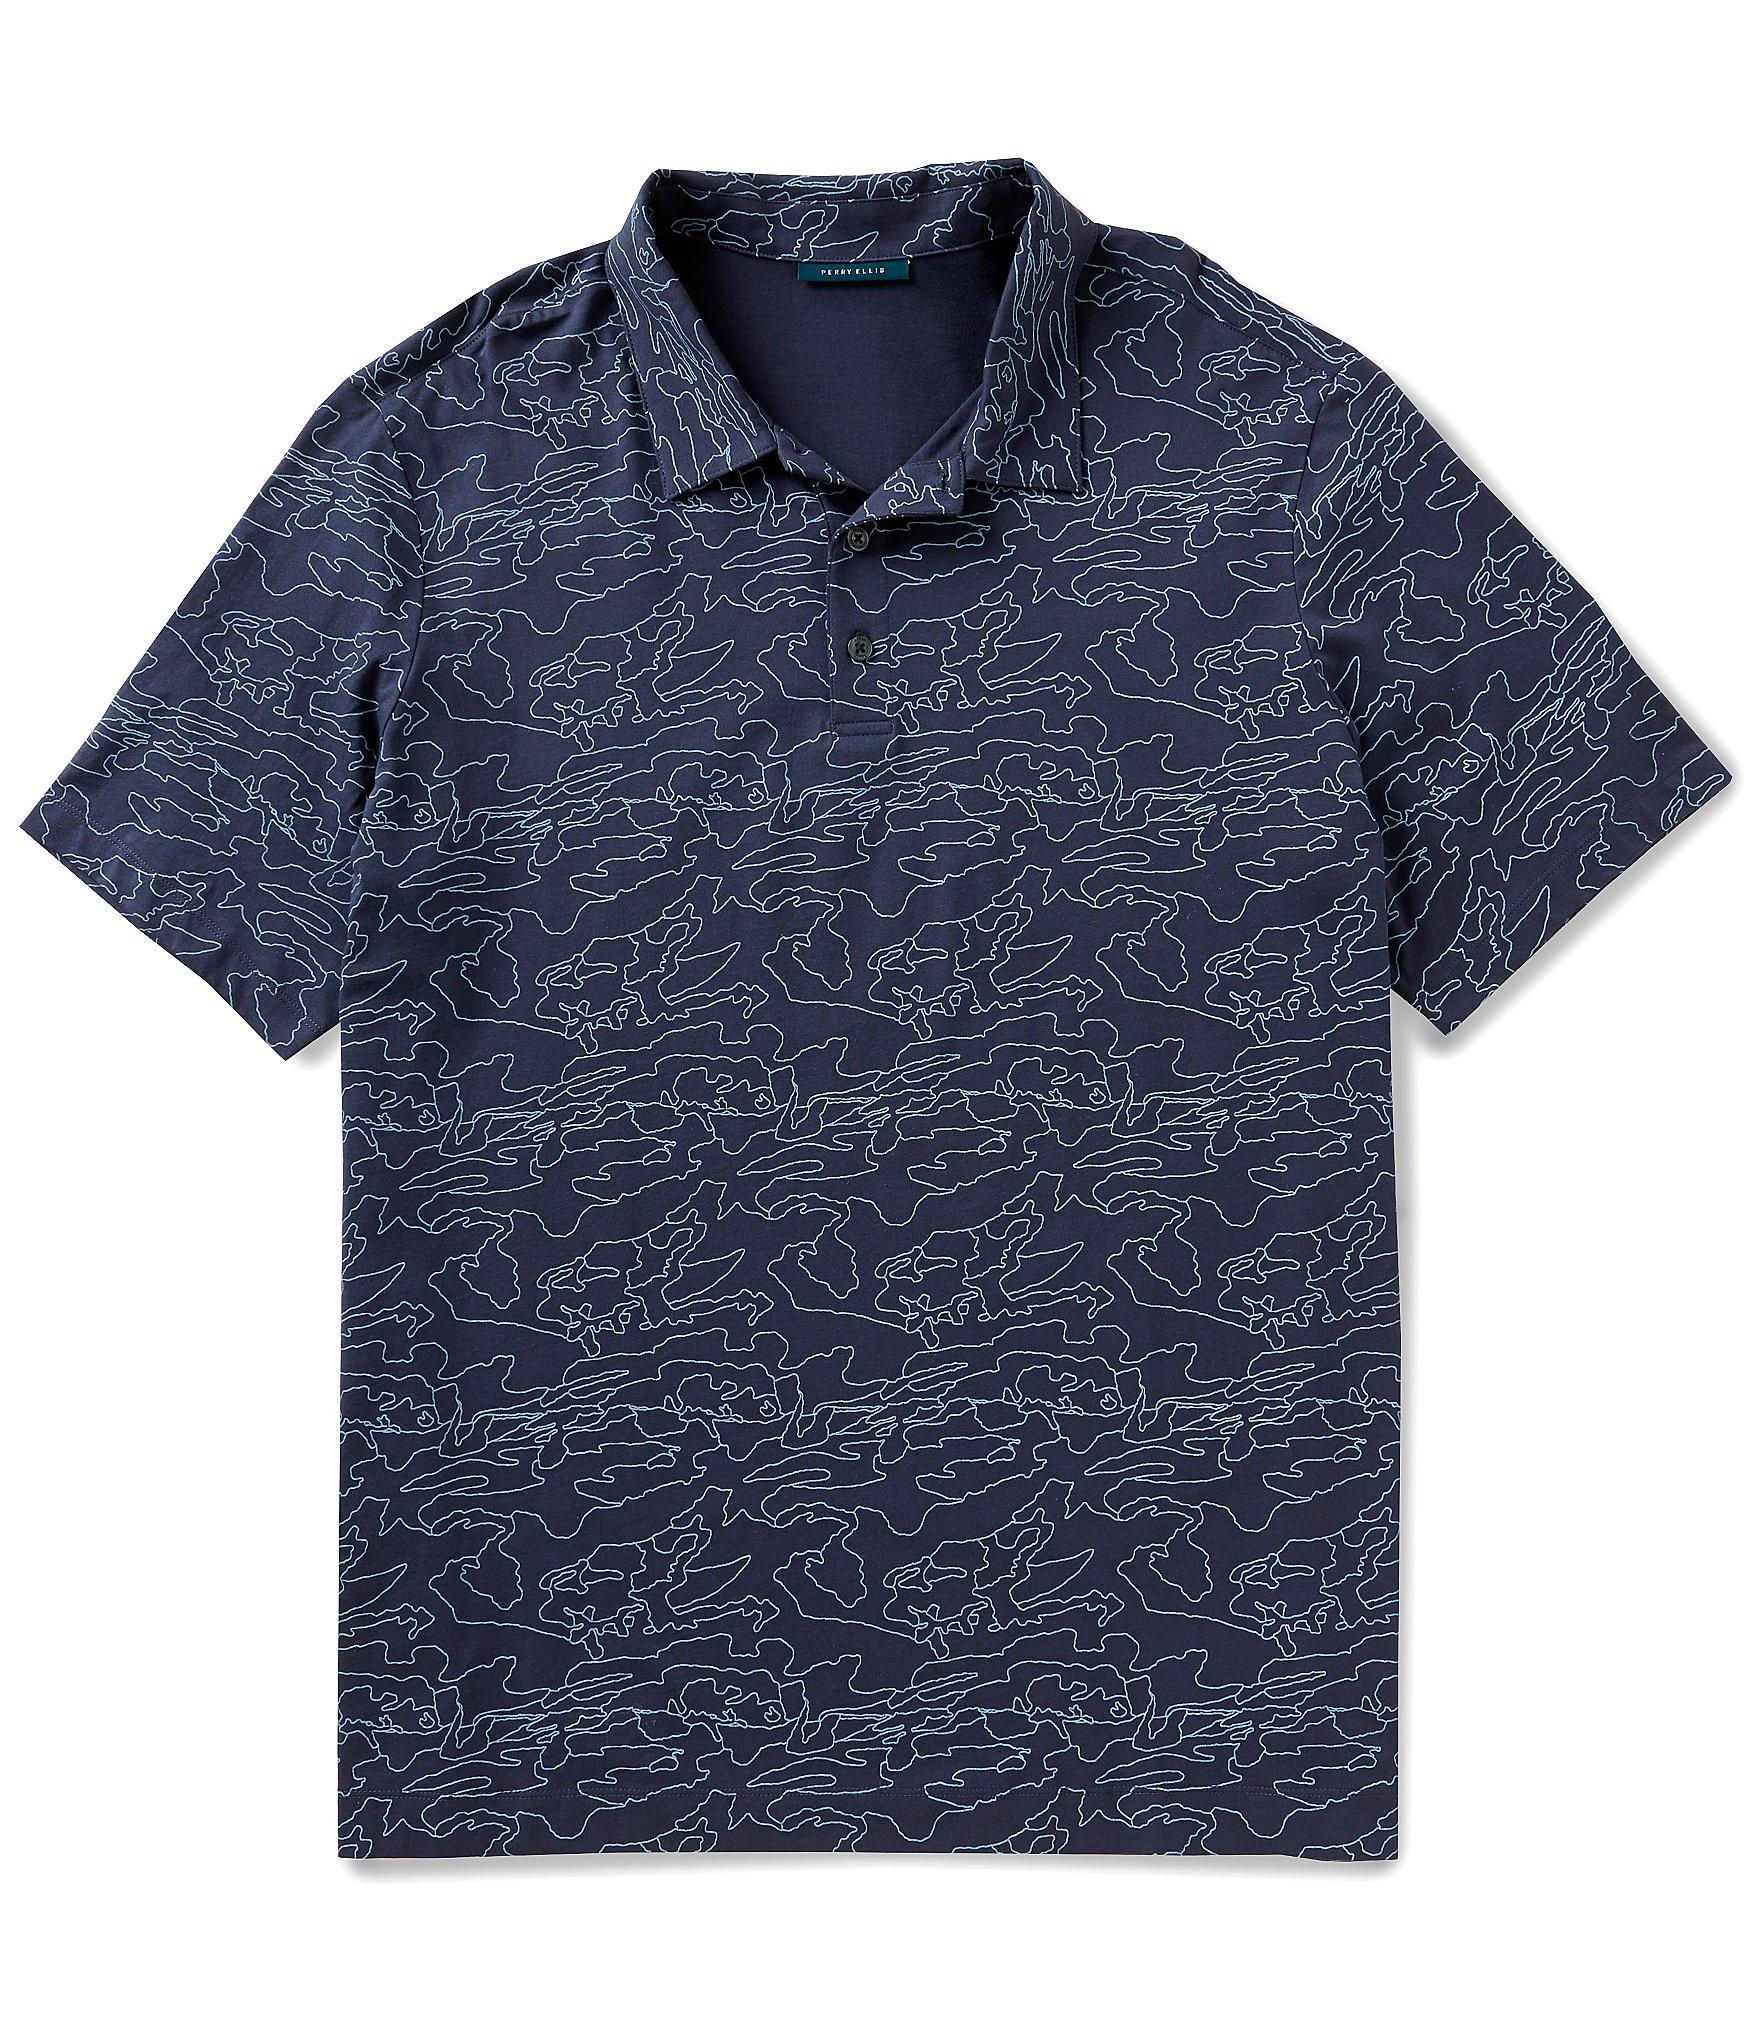 Perry Ellis Big Tall Camo Short Sleeve Polo Shirt Dillards